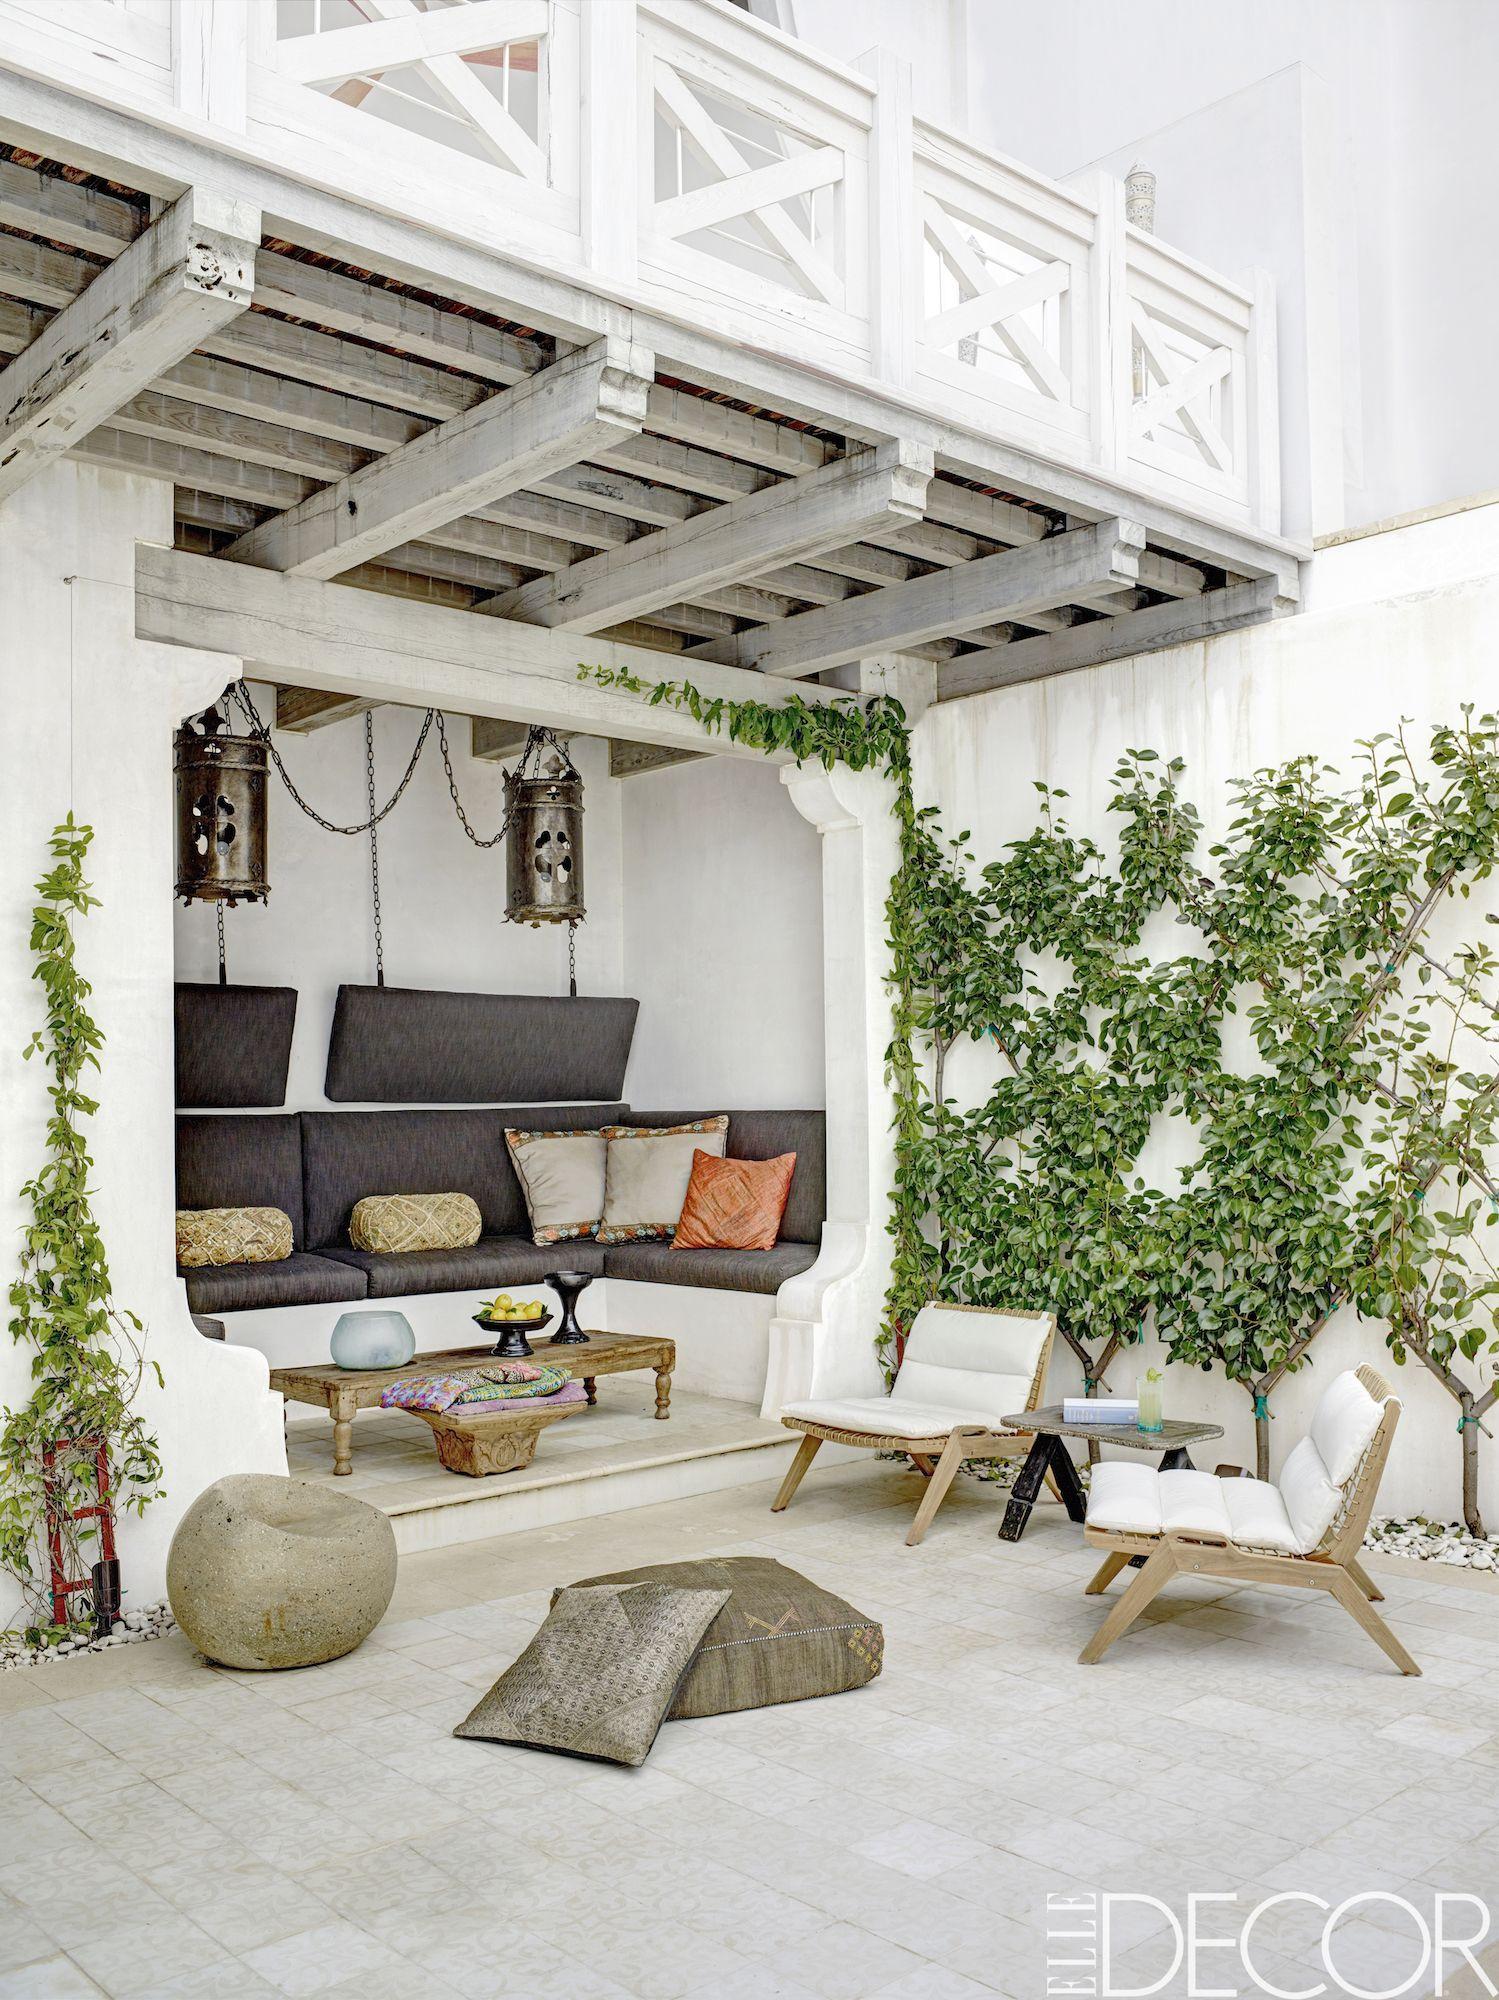 30 Best Small Patio Ideas - Small Patio Furniture \u0026 Design